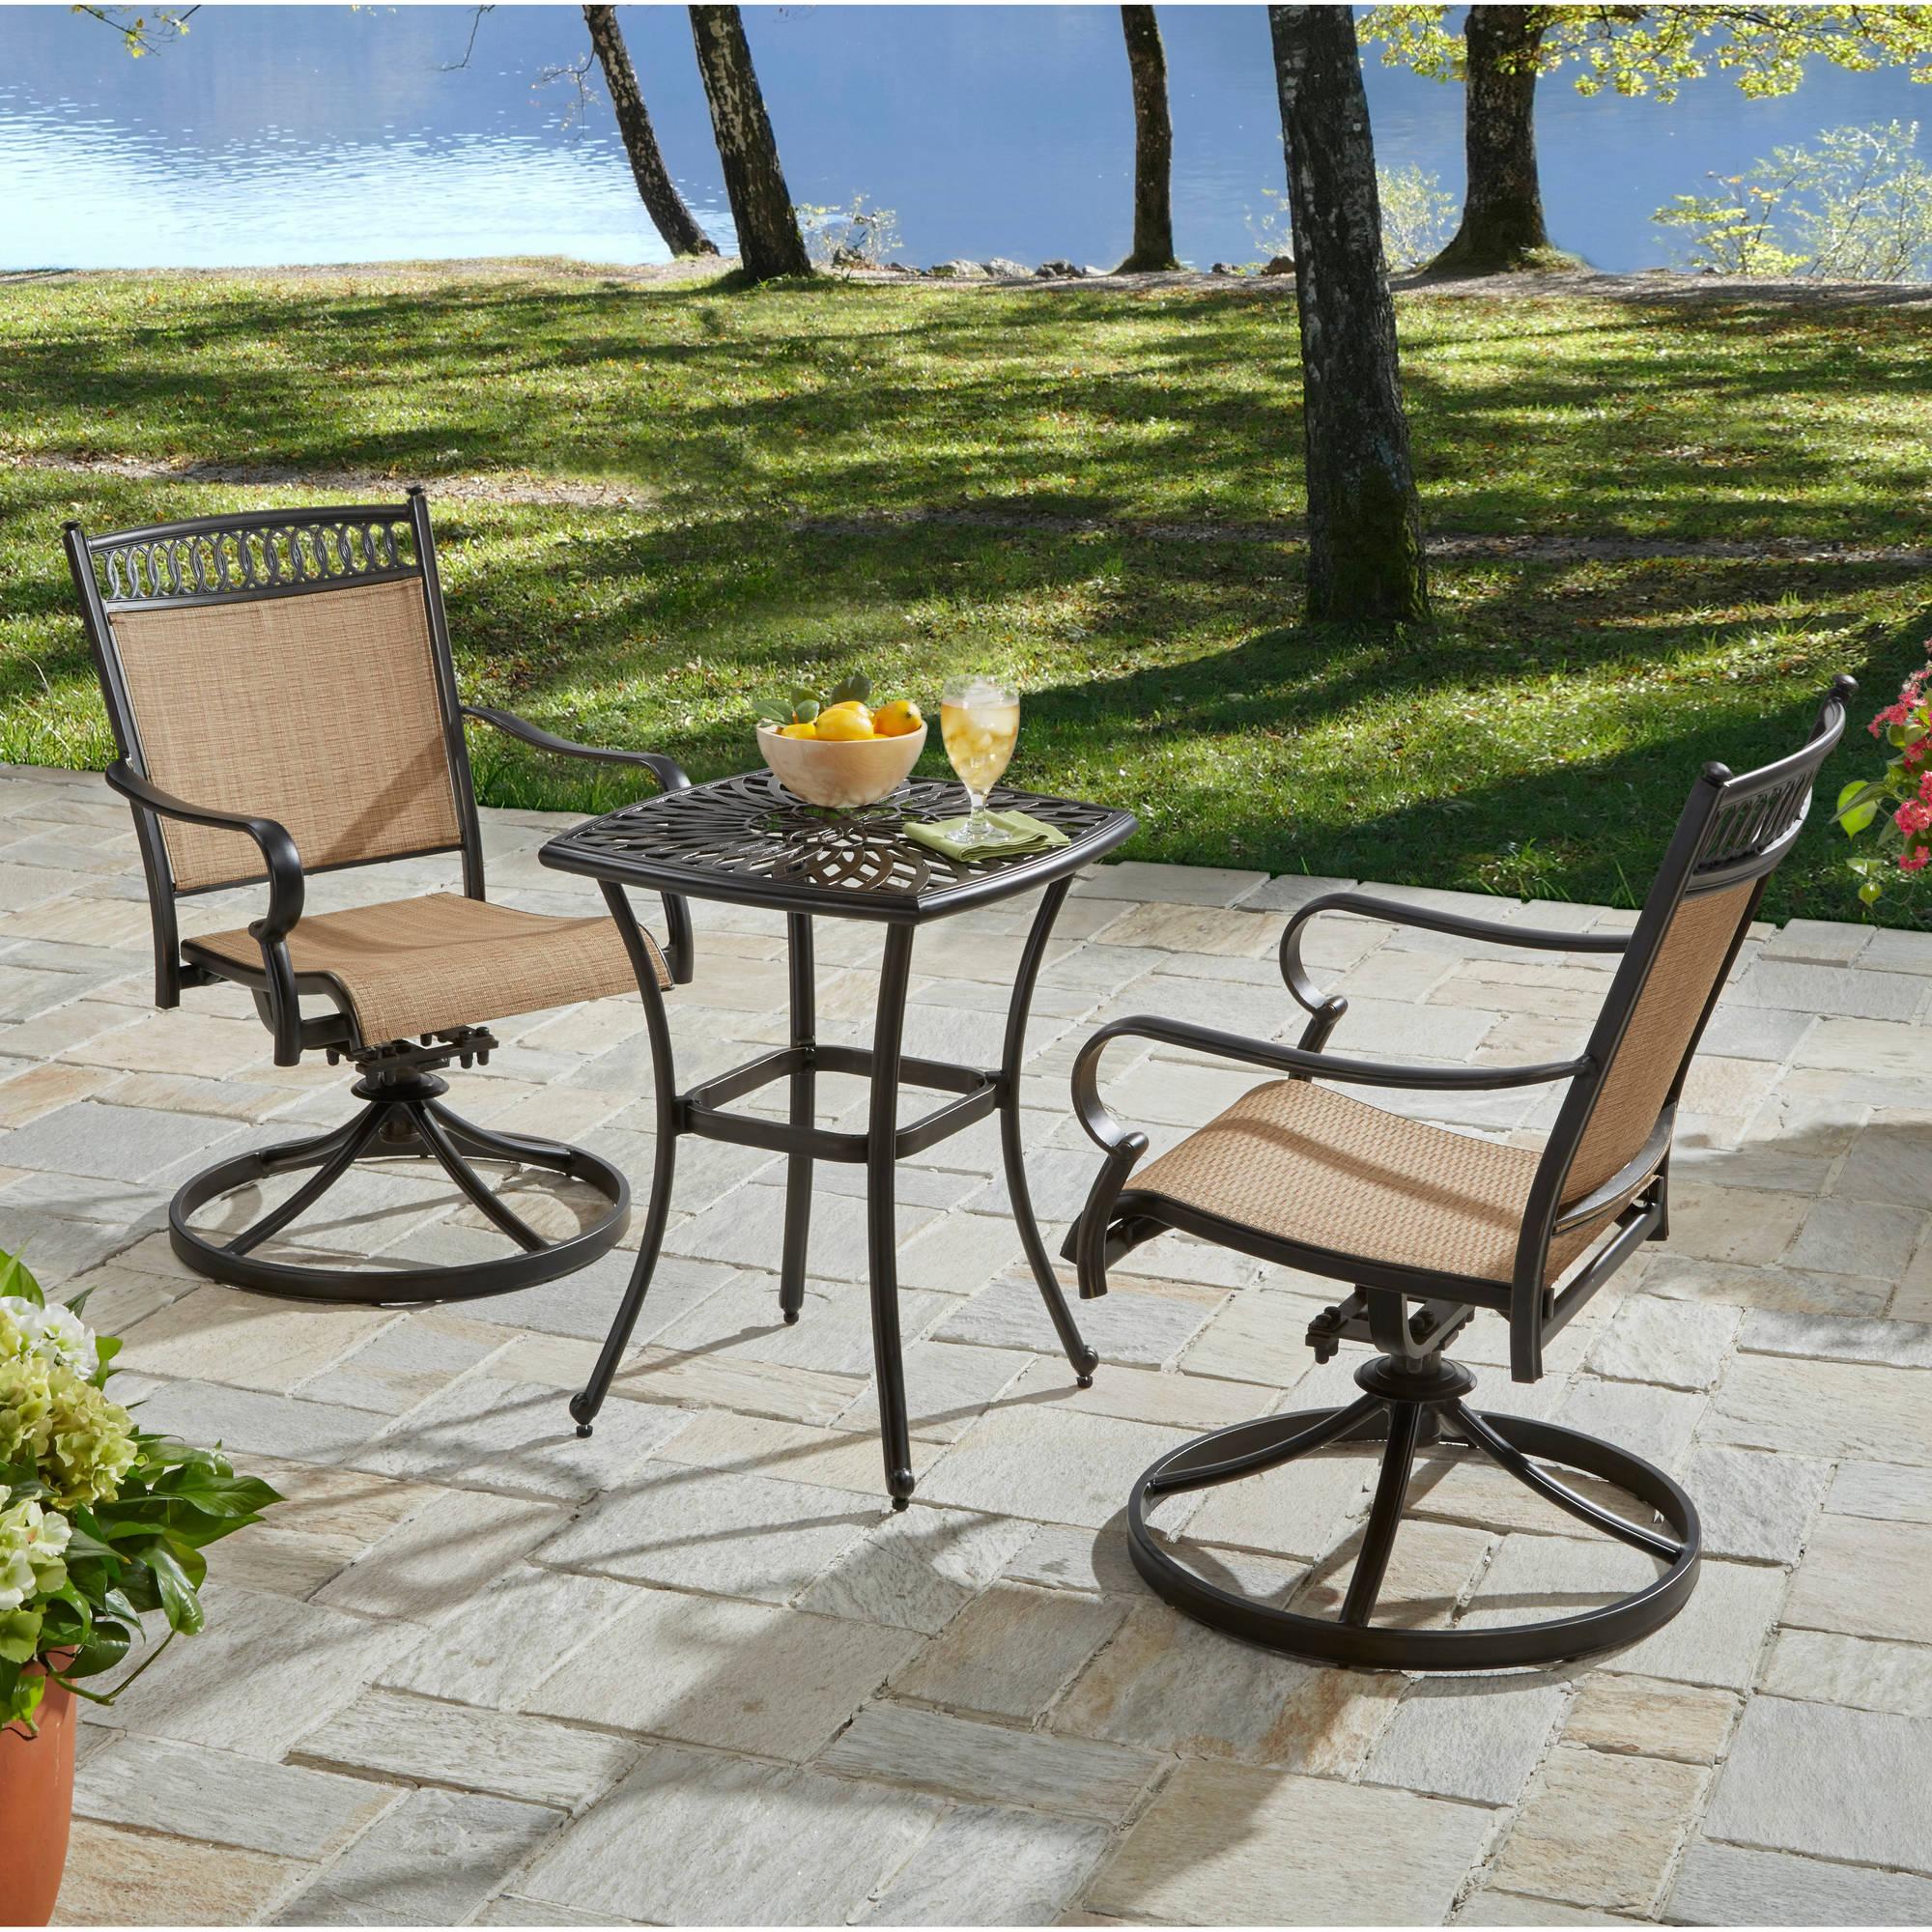 Better Homes and Gardens Warrens 3 Piece Outdoor Bistro Set